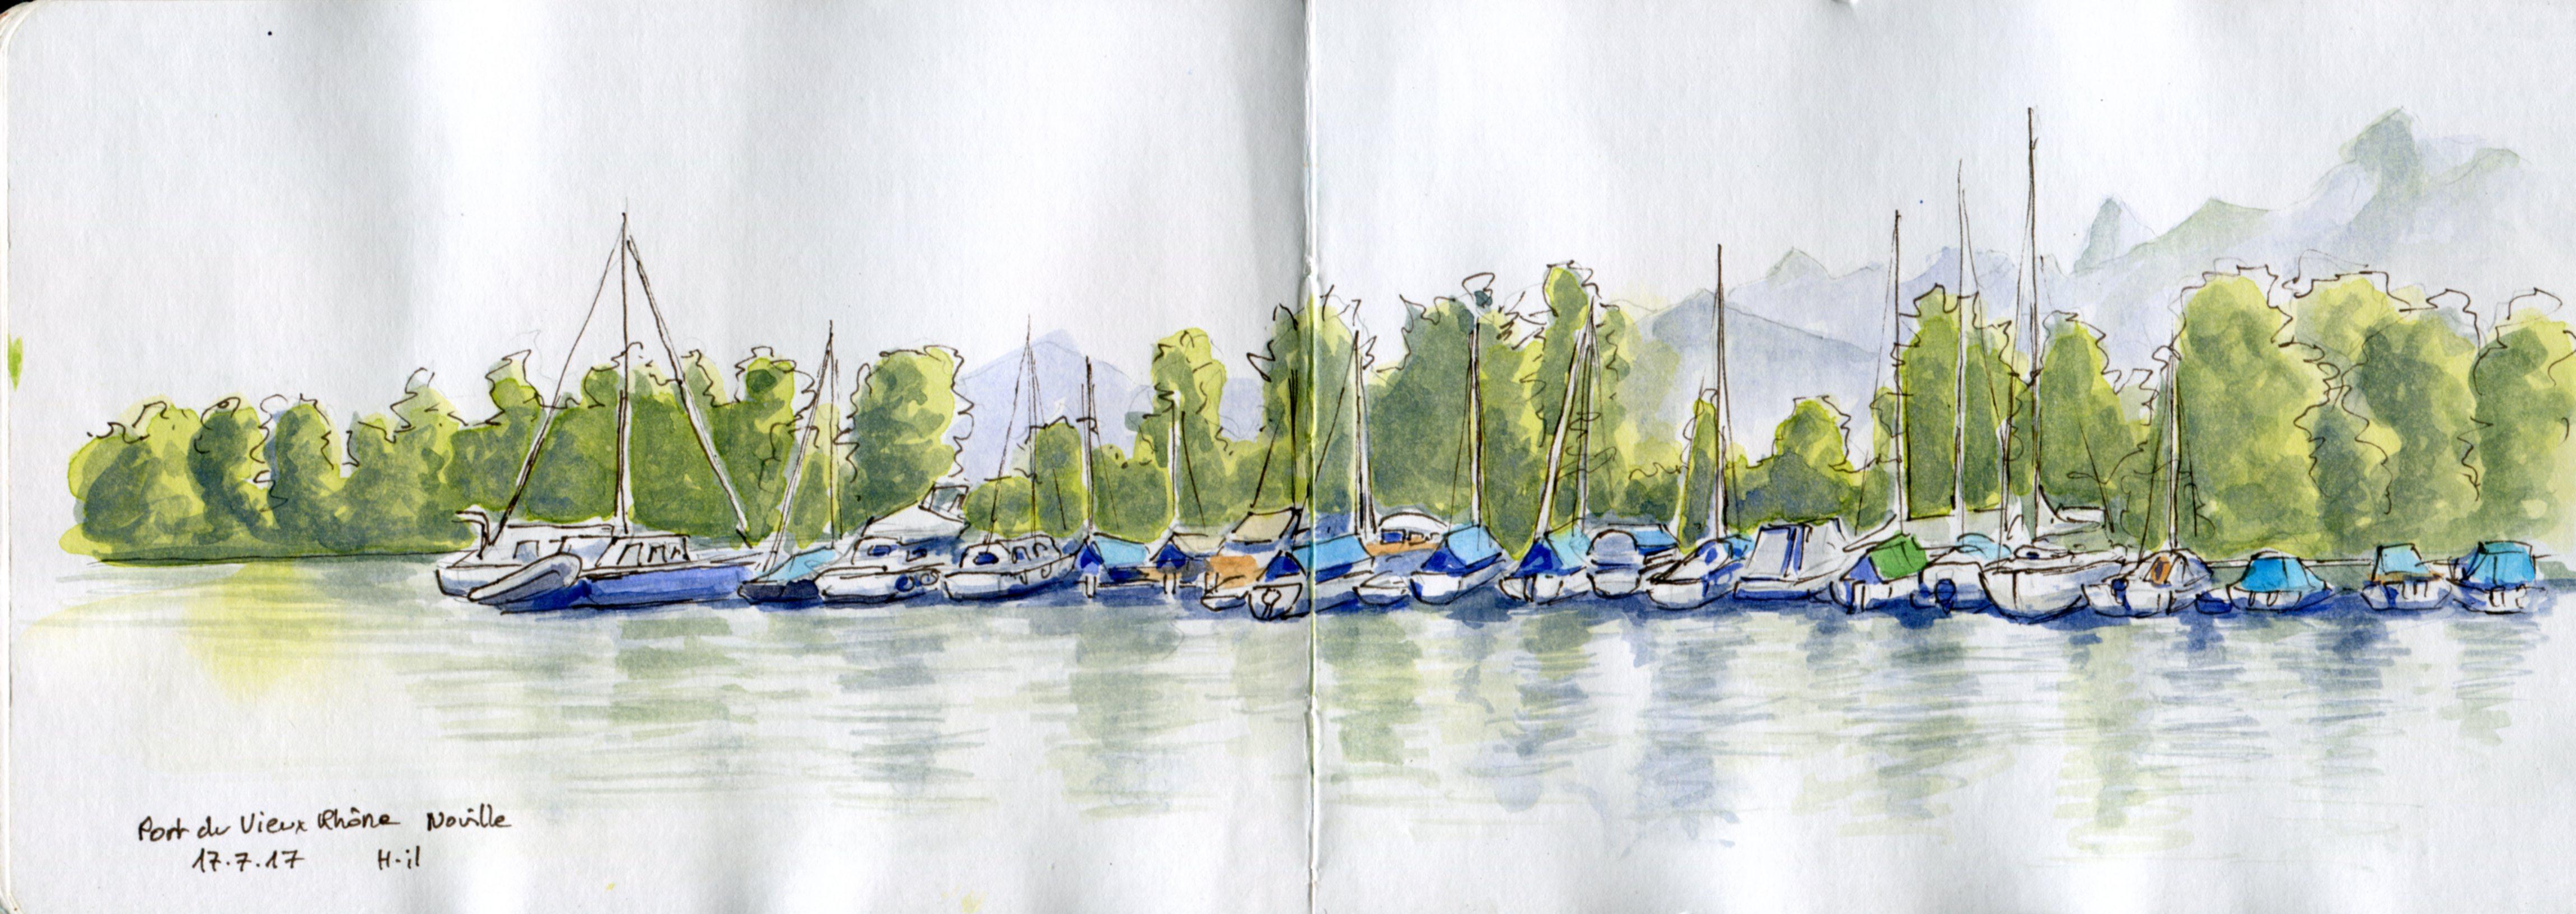 panorama_Vieux_Rhône